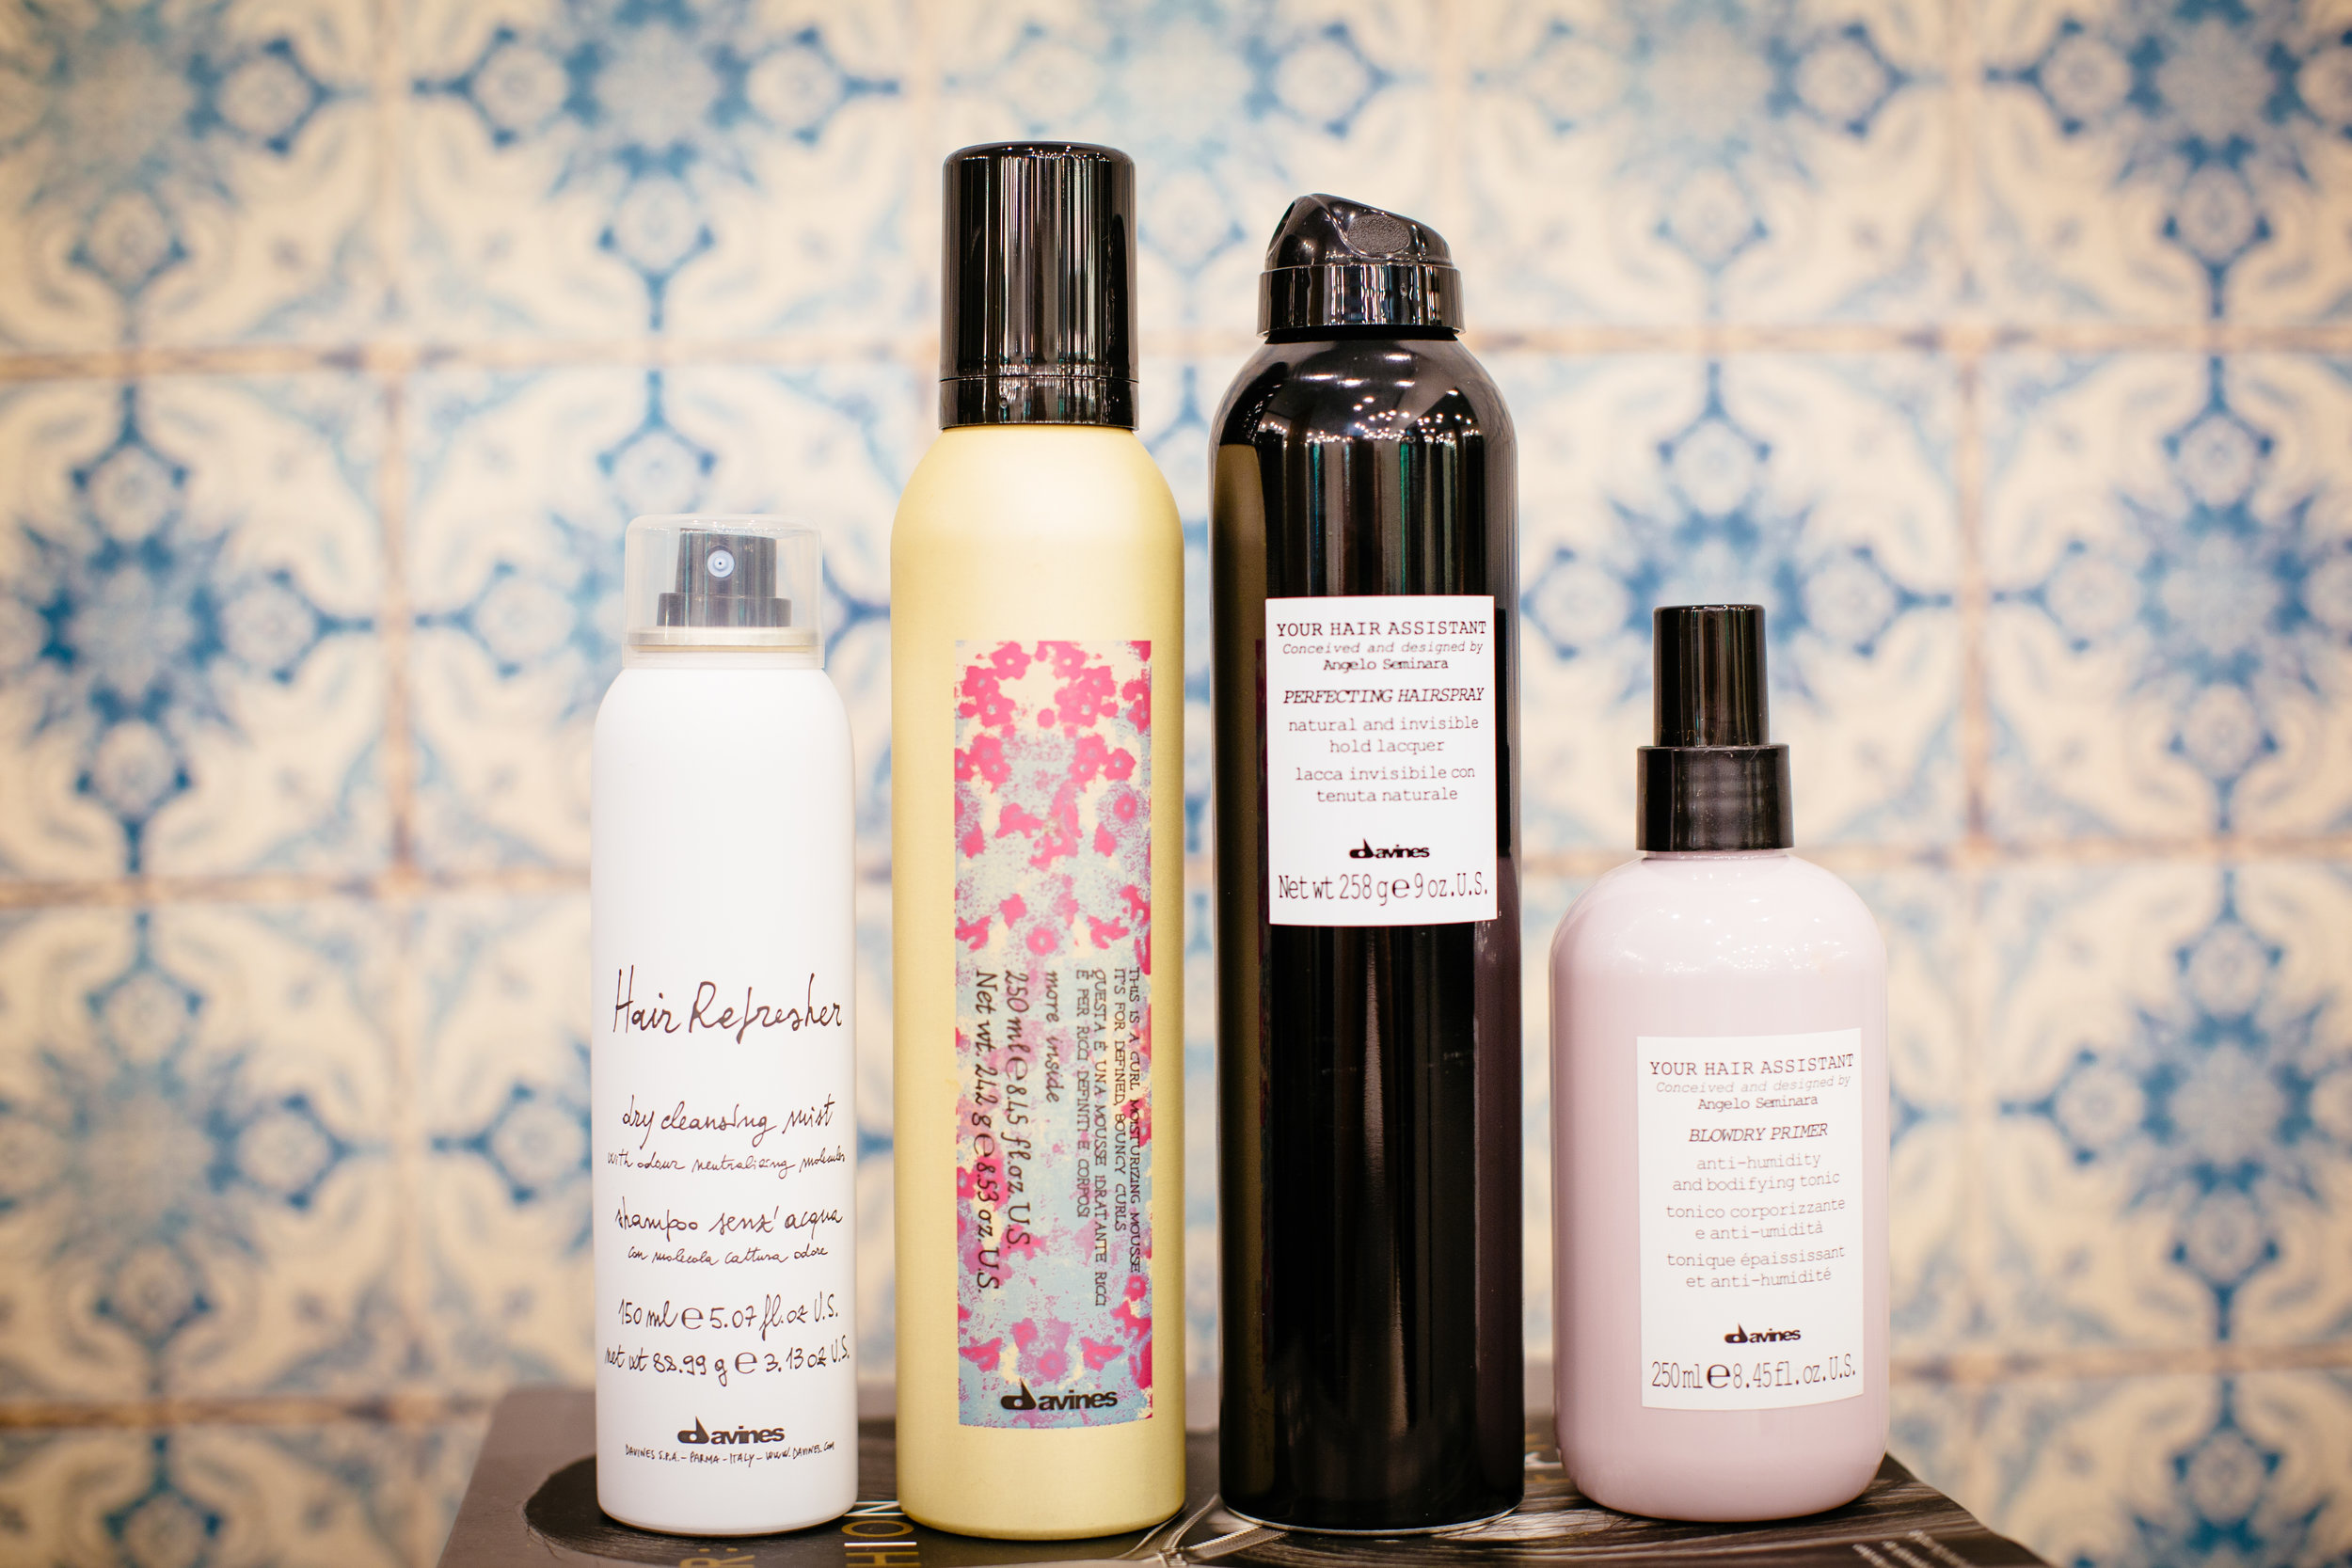 Davines Hair Refresher | Davines Curl Mousse | Davines Perfecting Hairspray | Davines Blowdry Primer